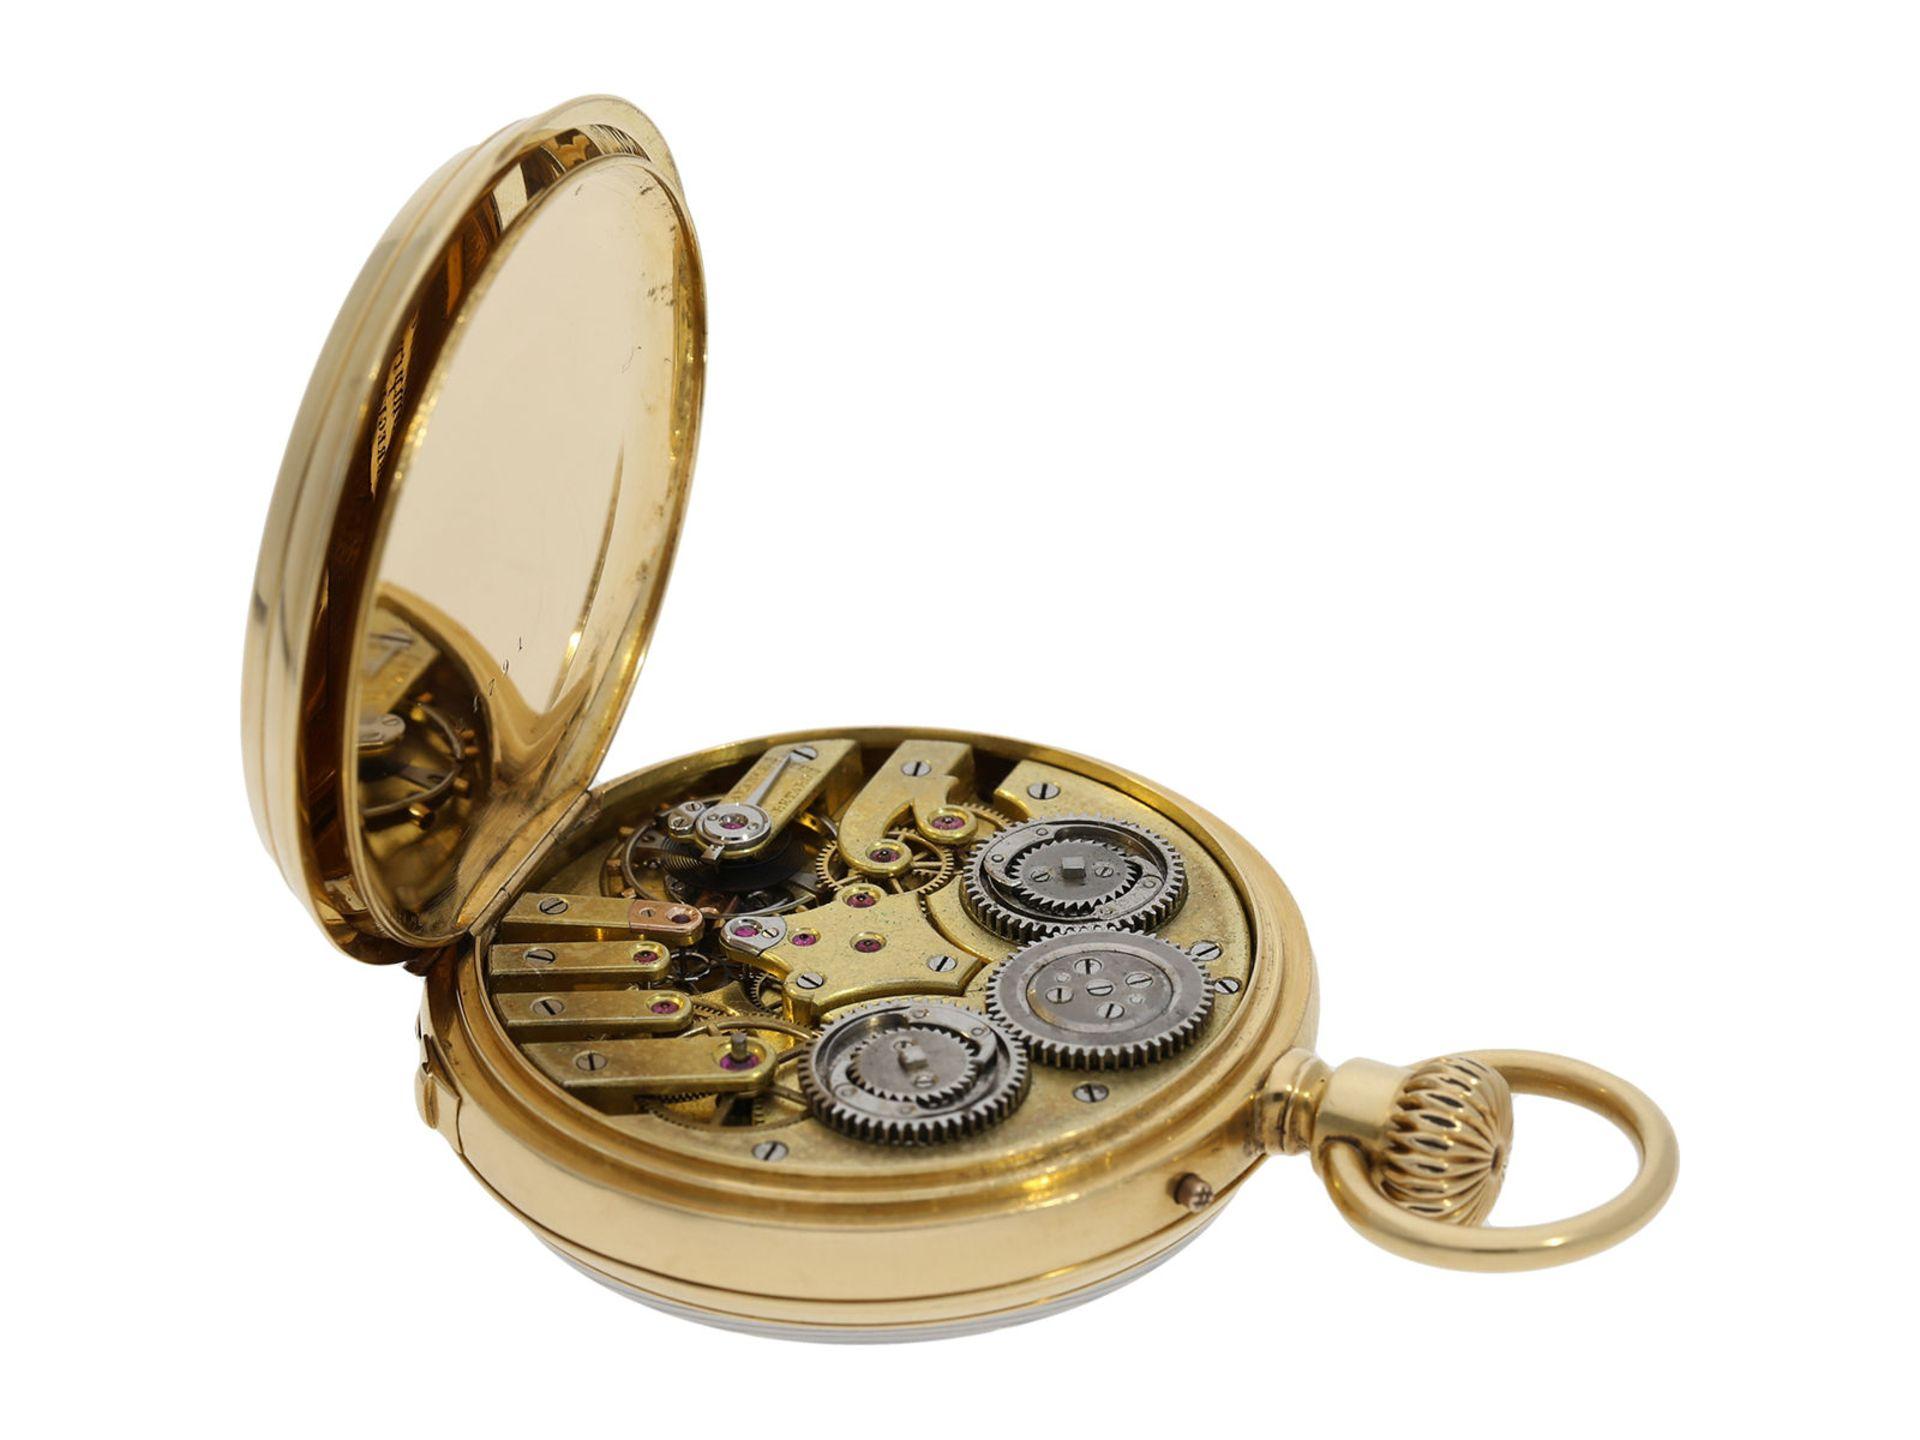 Pocket watch: early precision pocket watch with Seconde Morte, very fine quality, DuBois & LeRoy No. - Bild 3 aus 5